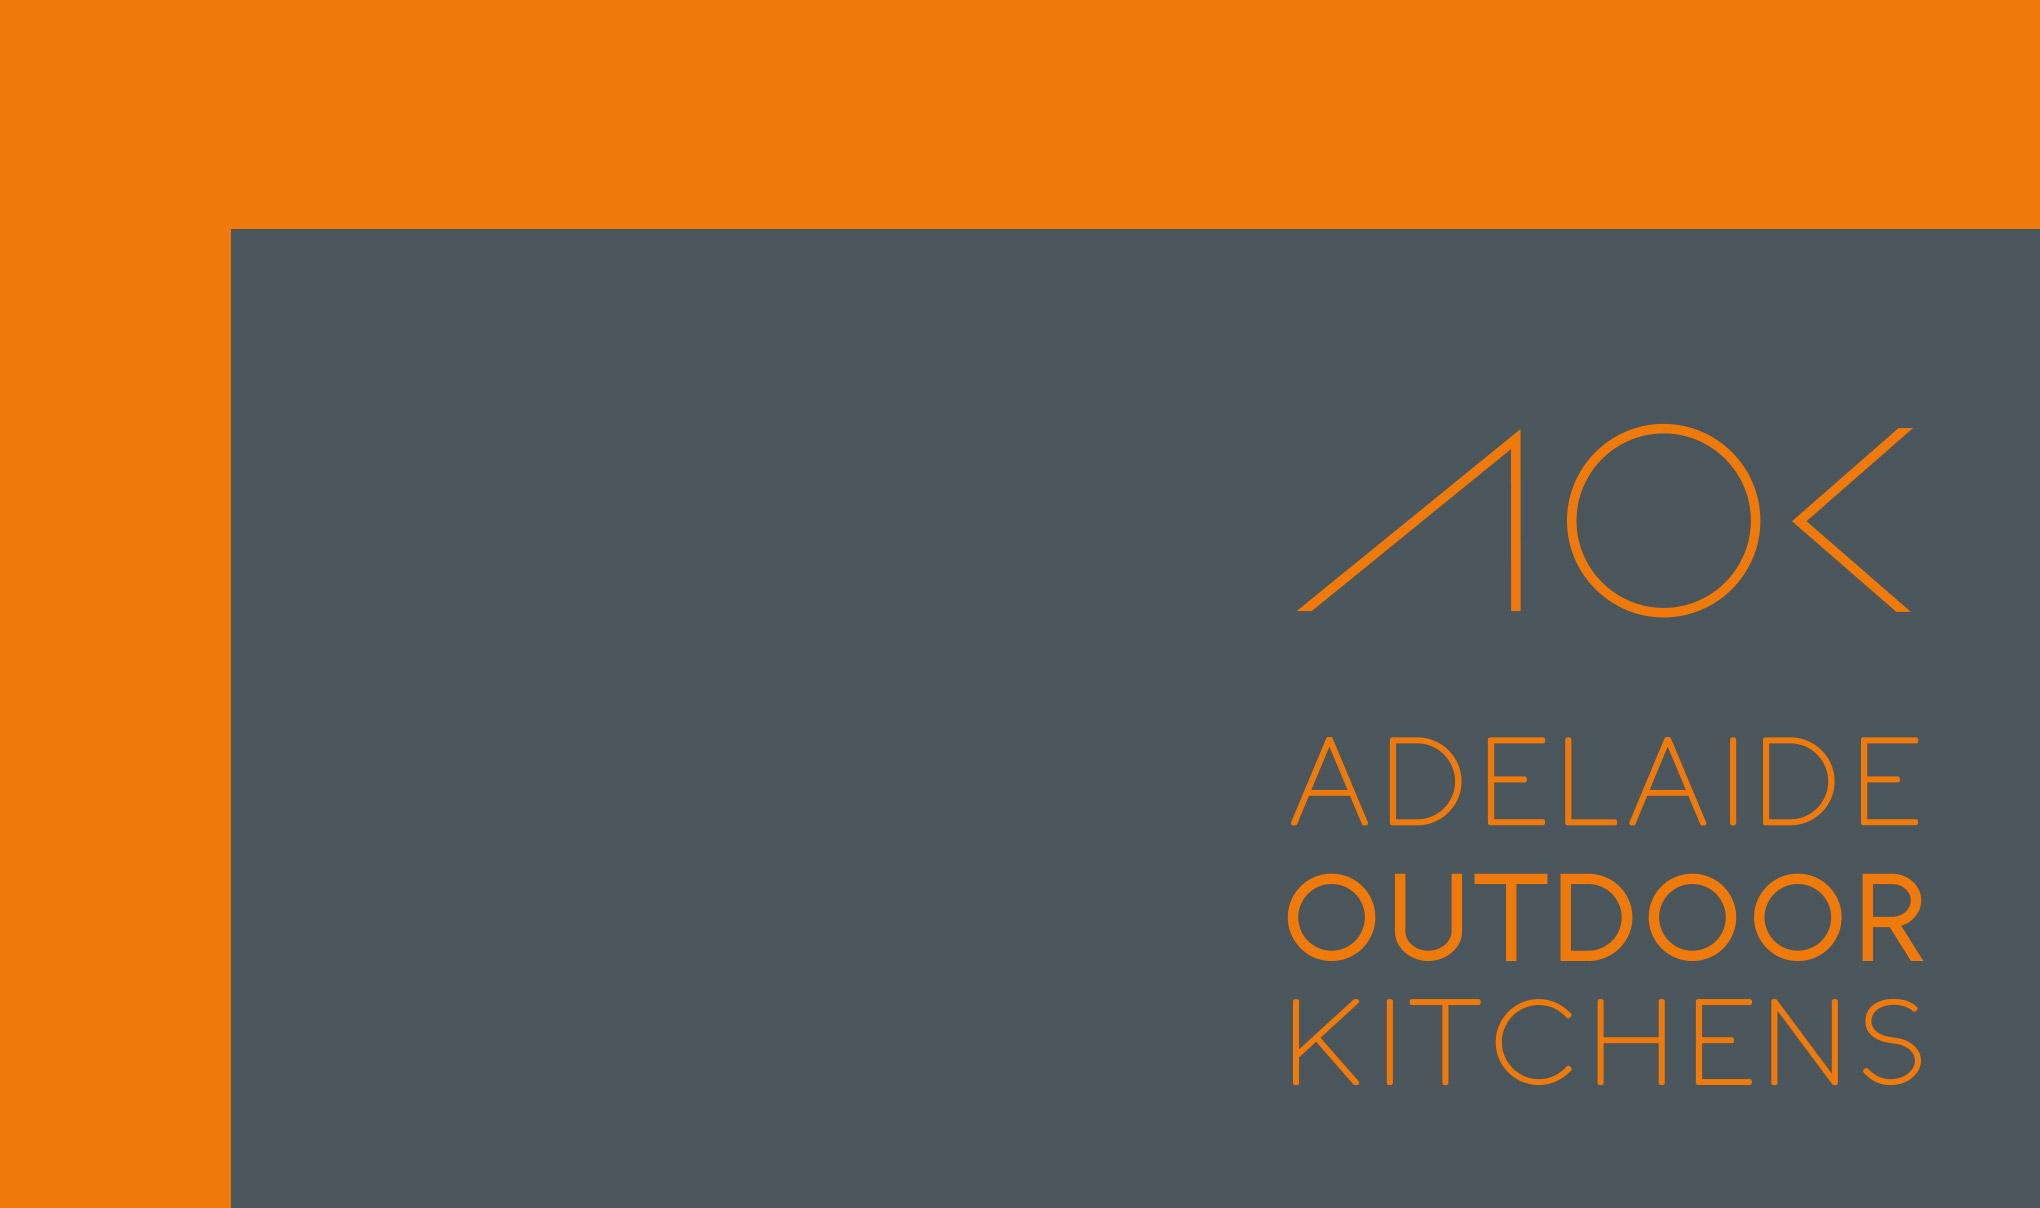 Identity Design for Australian outdoor kitchen company. Image shows brand logo in orange on grey. Identity design created by Flipflop Design Ltd.